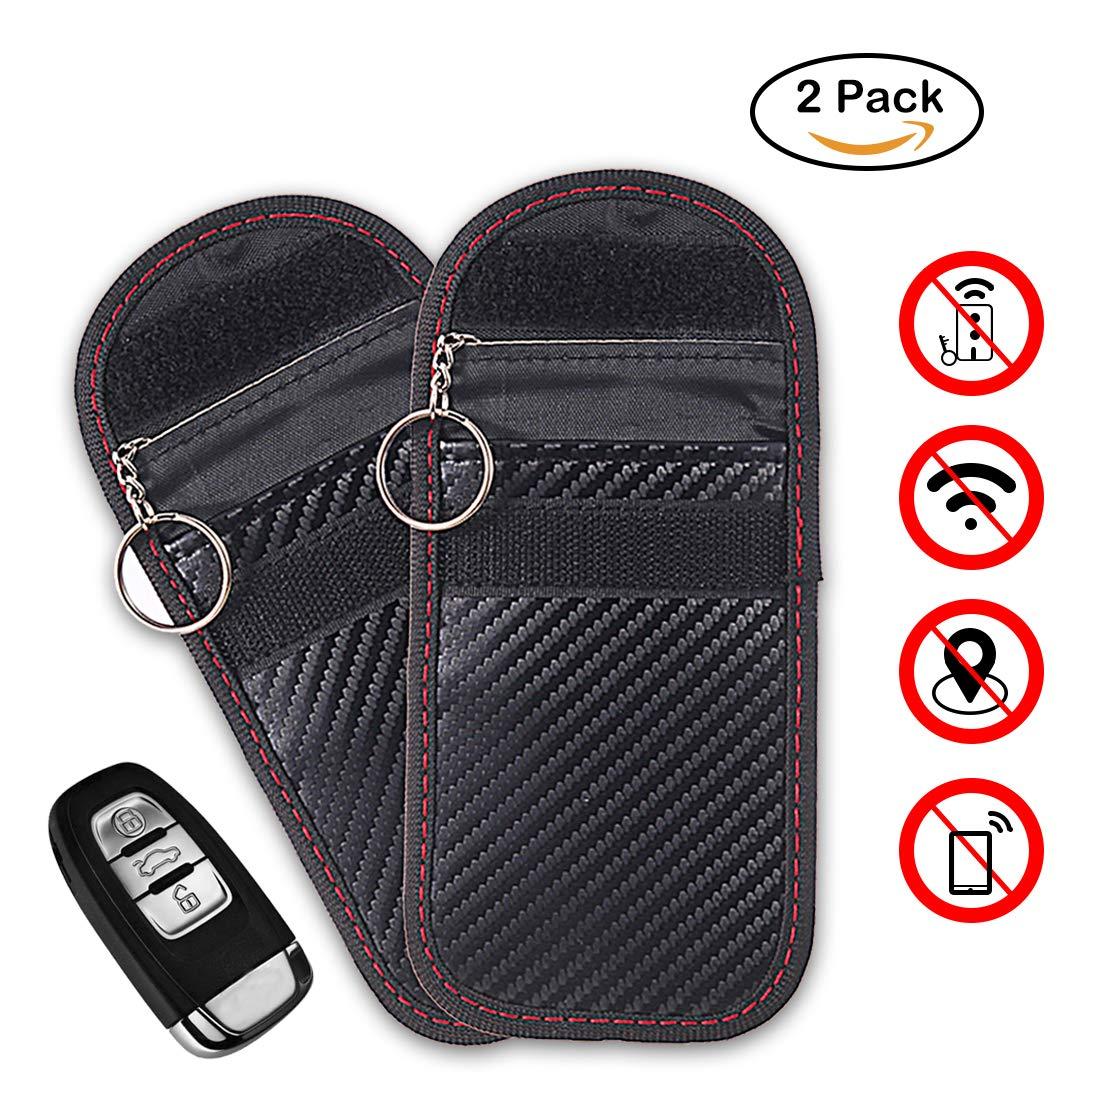 Car Key Signal Blocker Case,Faraday Key fob Protector, Antitheft Lock Devices,Car Key Protector WiFi/GSM/LTE/NFC/RF Blocker (Black) LEOKE LK-001